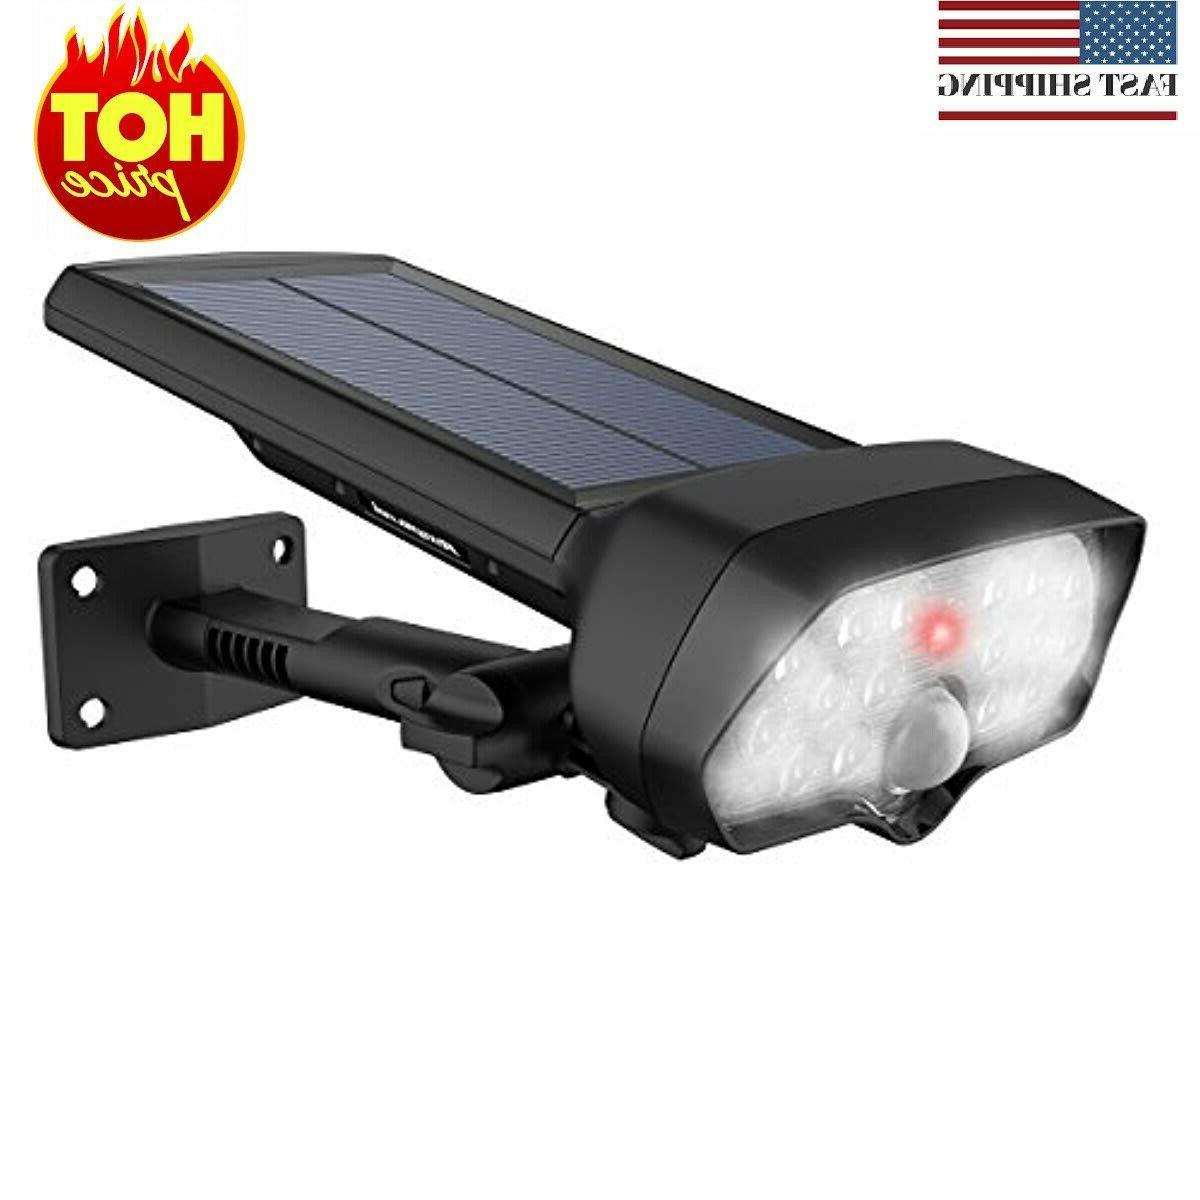 16 led solar lights outdoor landscape spotlights